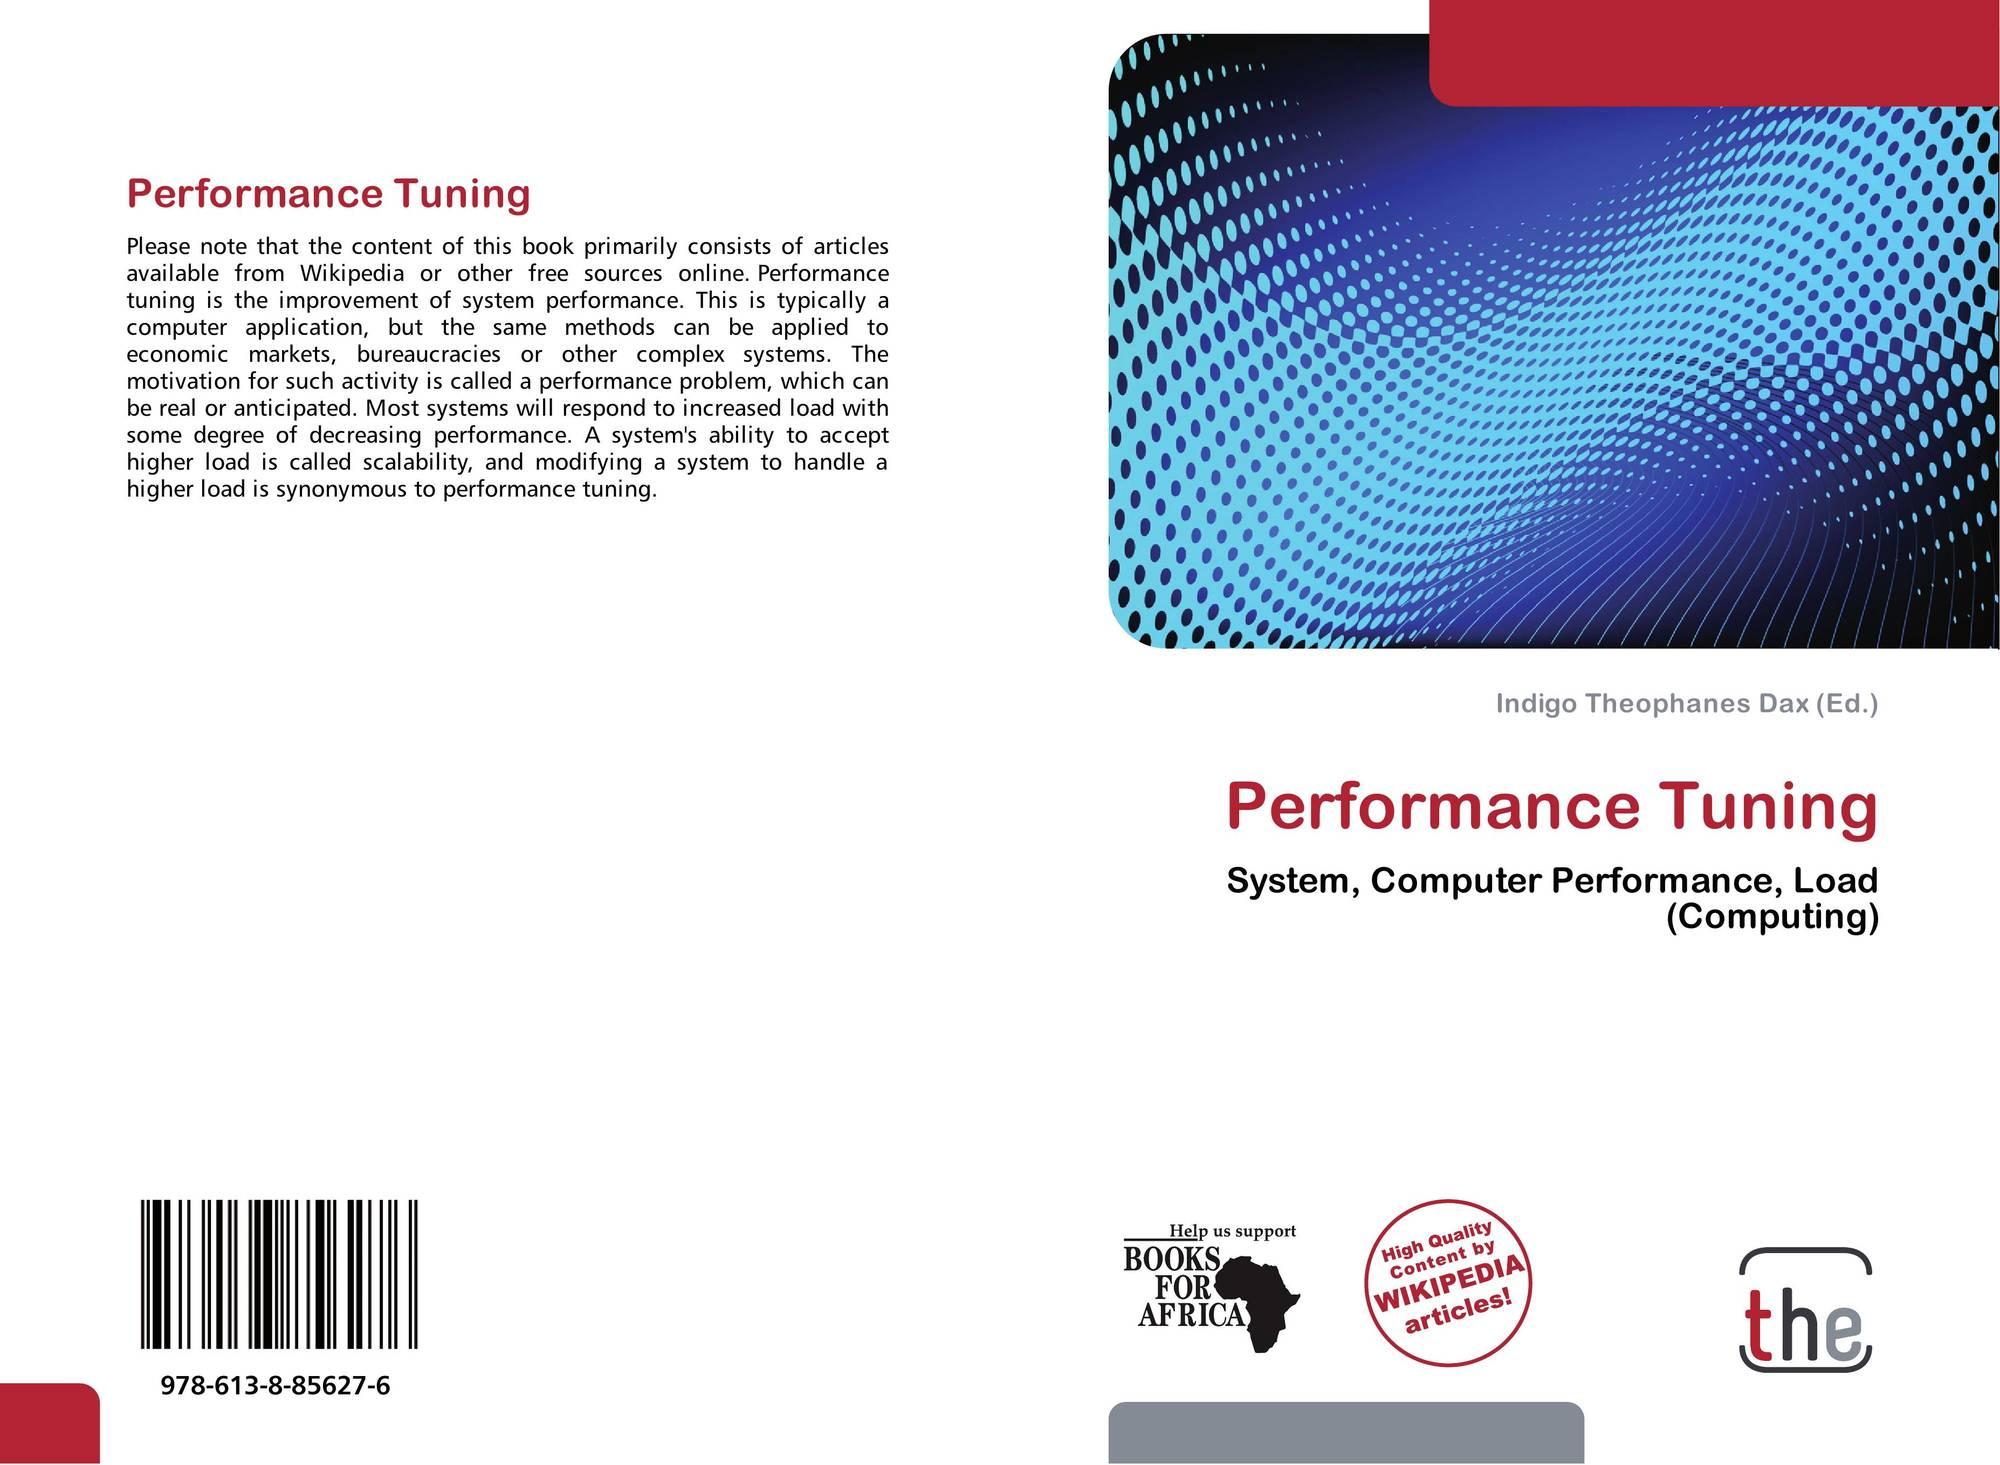 Performance Tuning, 978-613-8-85627-6, 6138856279 ,9786138856276